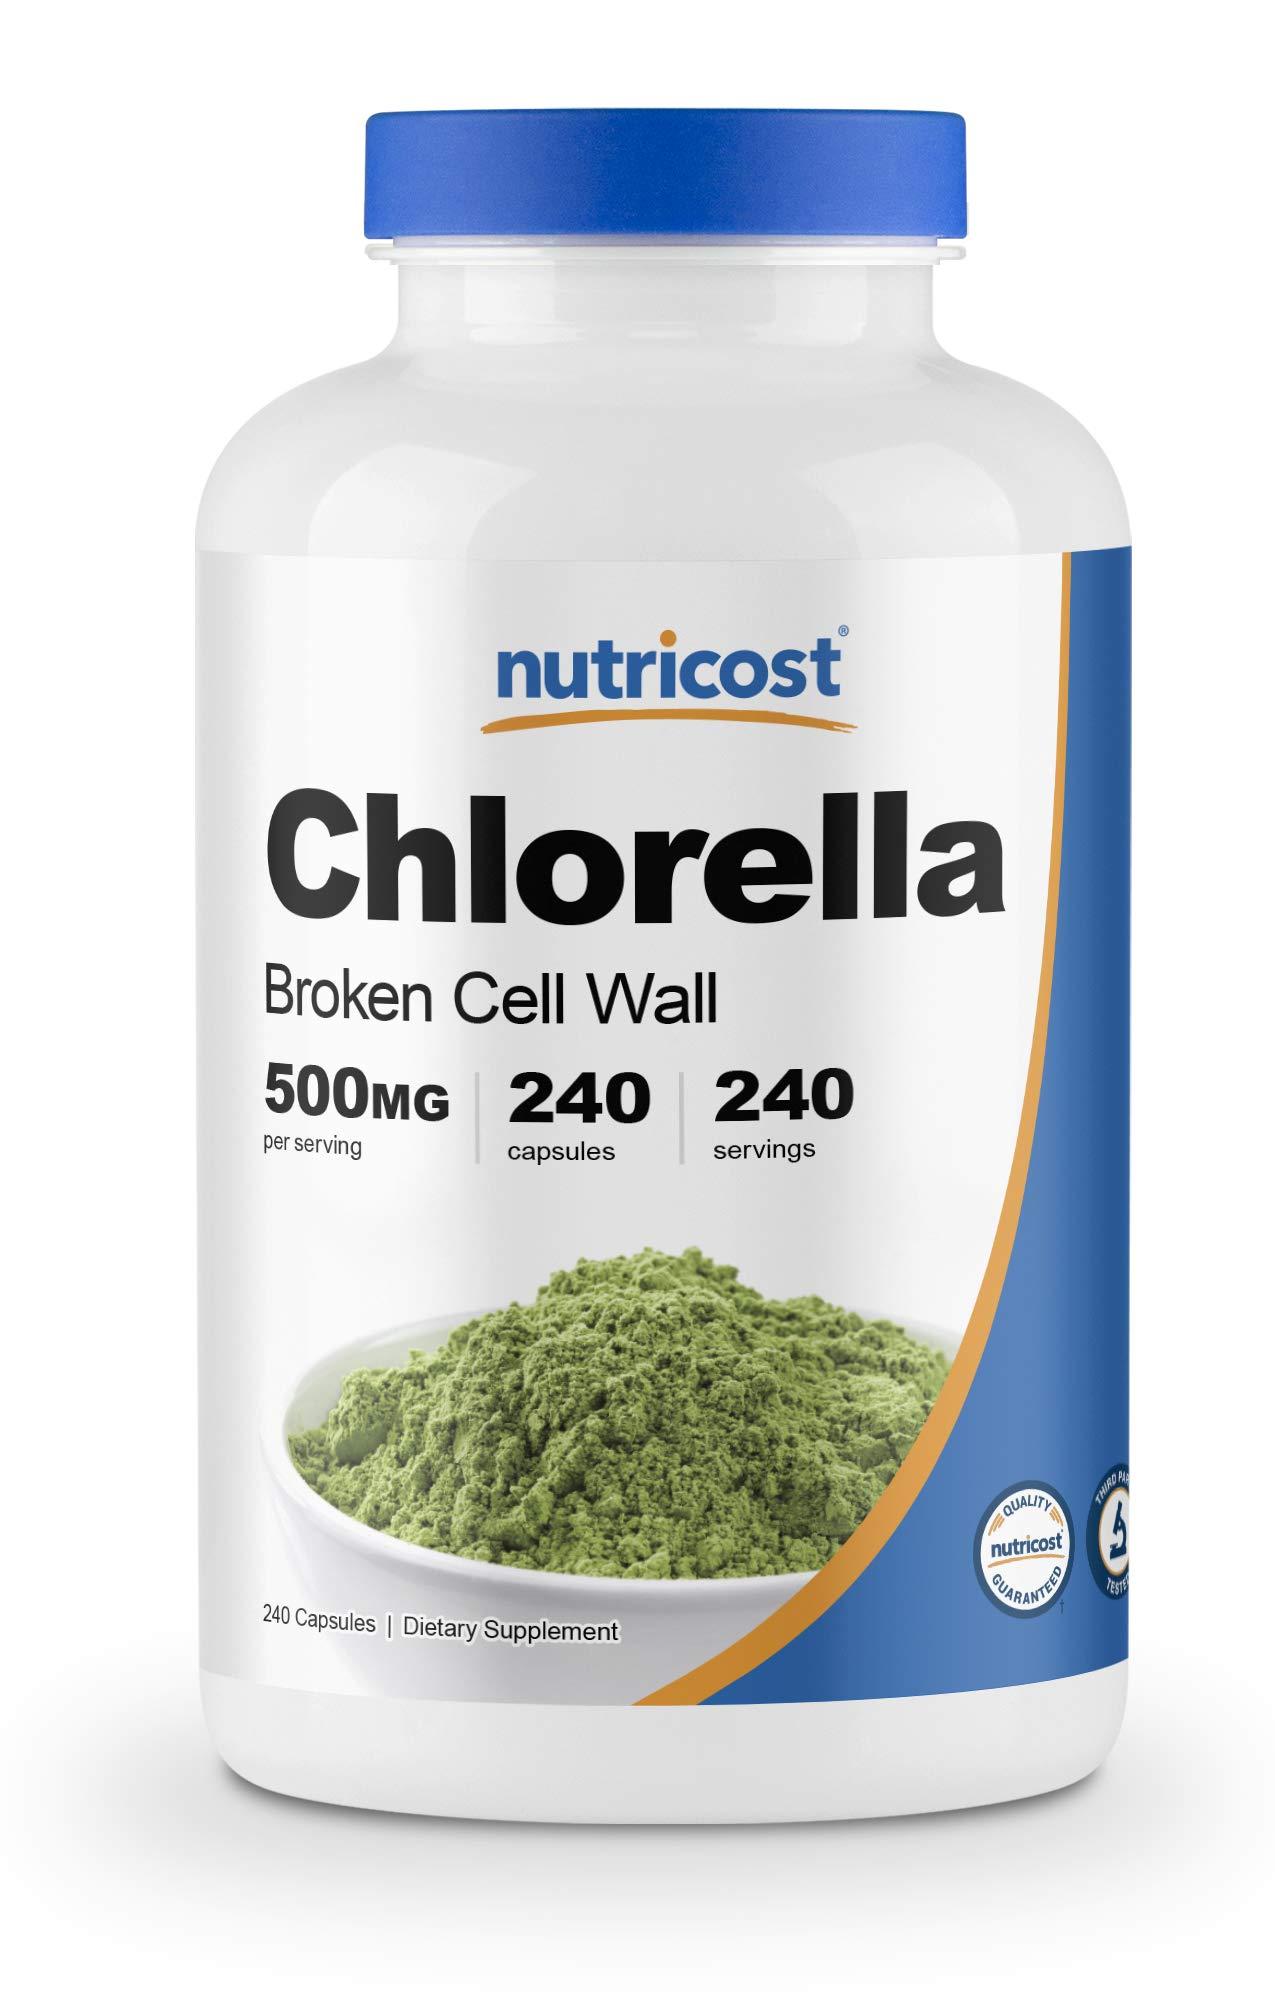 Nutricost Chlorella Capsules 500mg, 240 Vegetarian Capsules - Non-GMO and Gluten Free